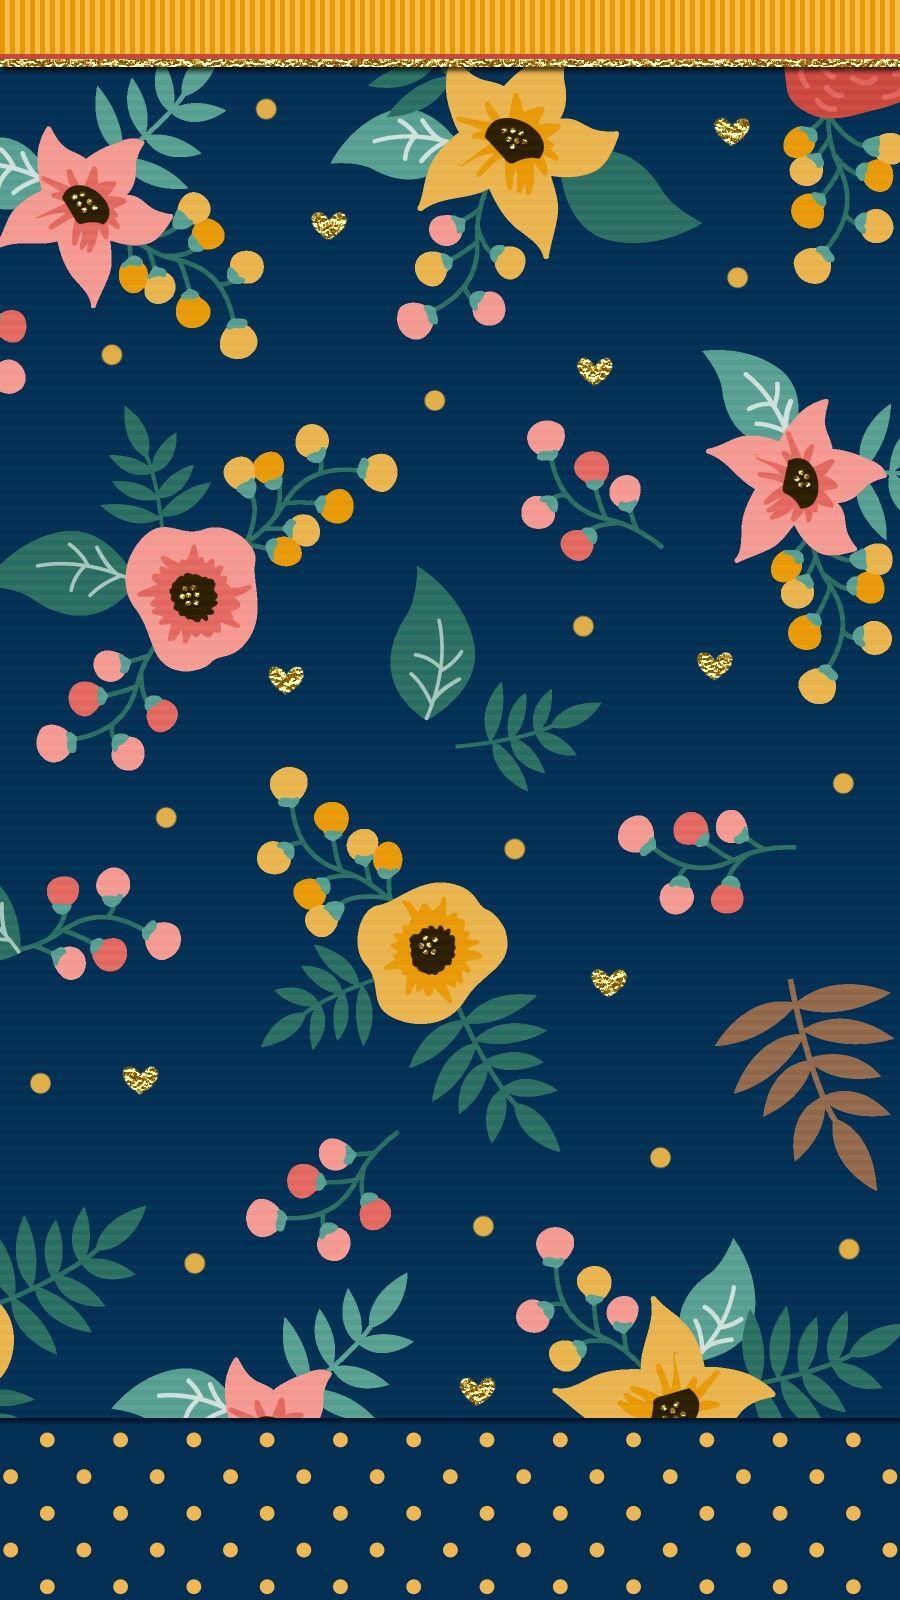 Navy Blue Floral Wallpaper Iphone Floral Wallpaper Iphone Blue Floral Wallpaper New Wallpaper Iphone